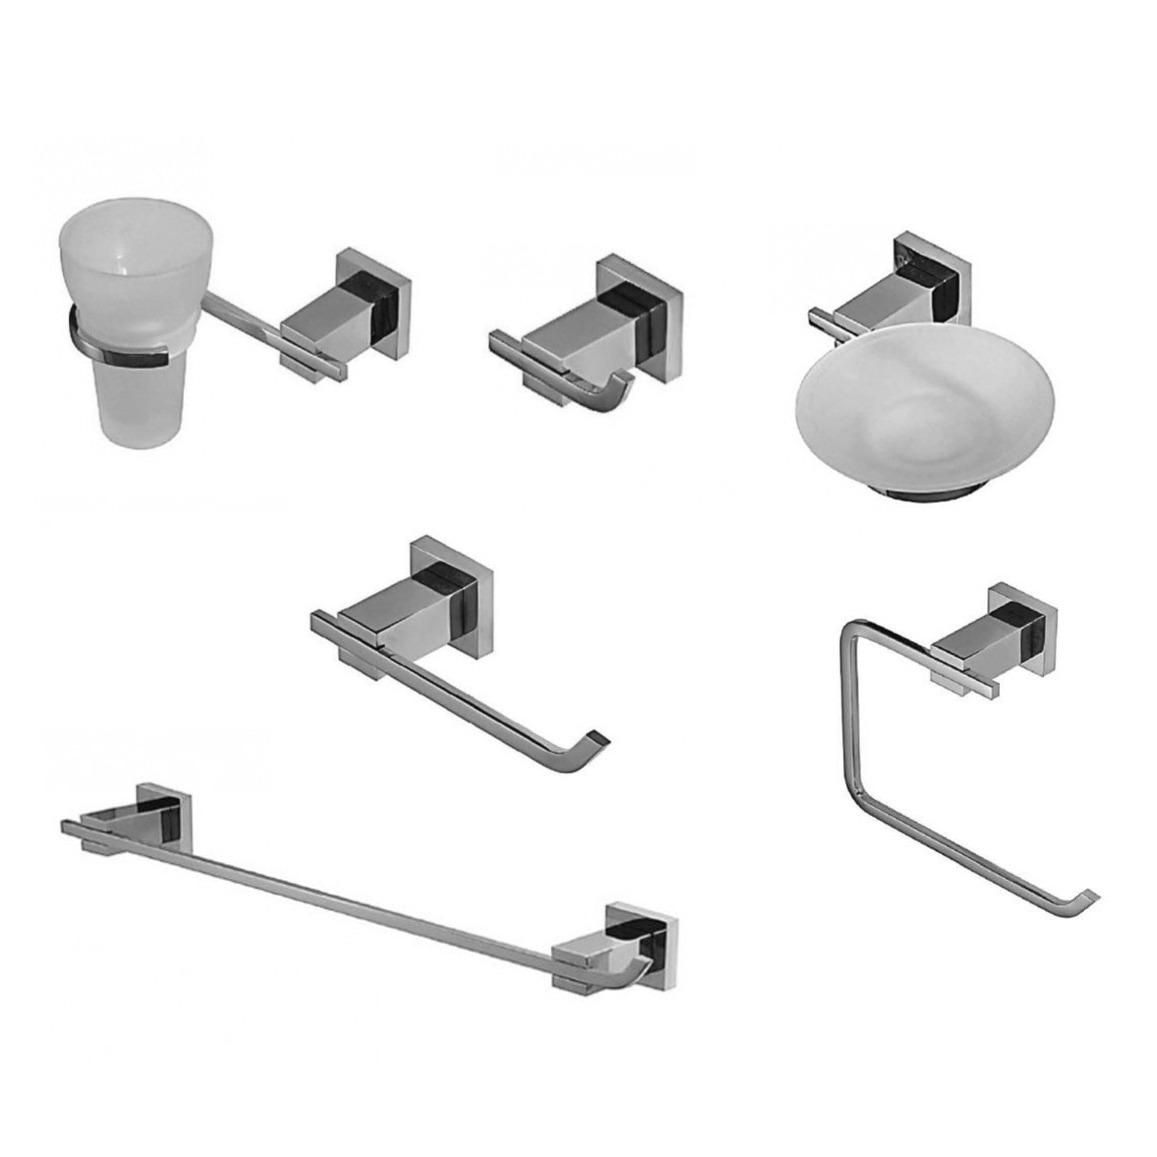 kit set accesorios baño hidromet geometry 6 piezas cromado. Cargando zoom. ecb20b3e2413